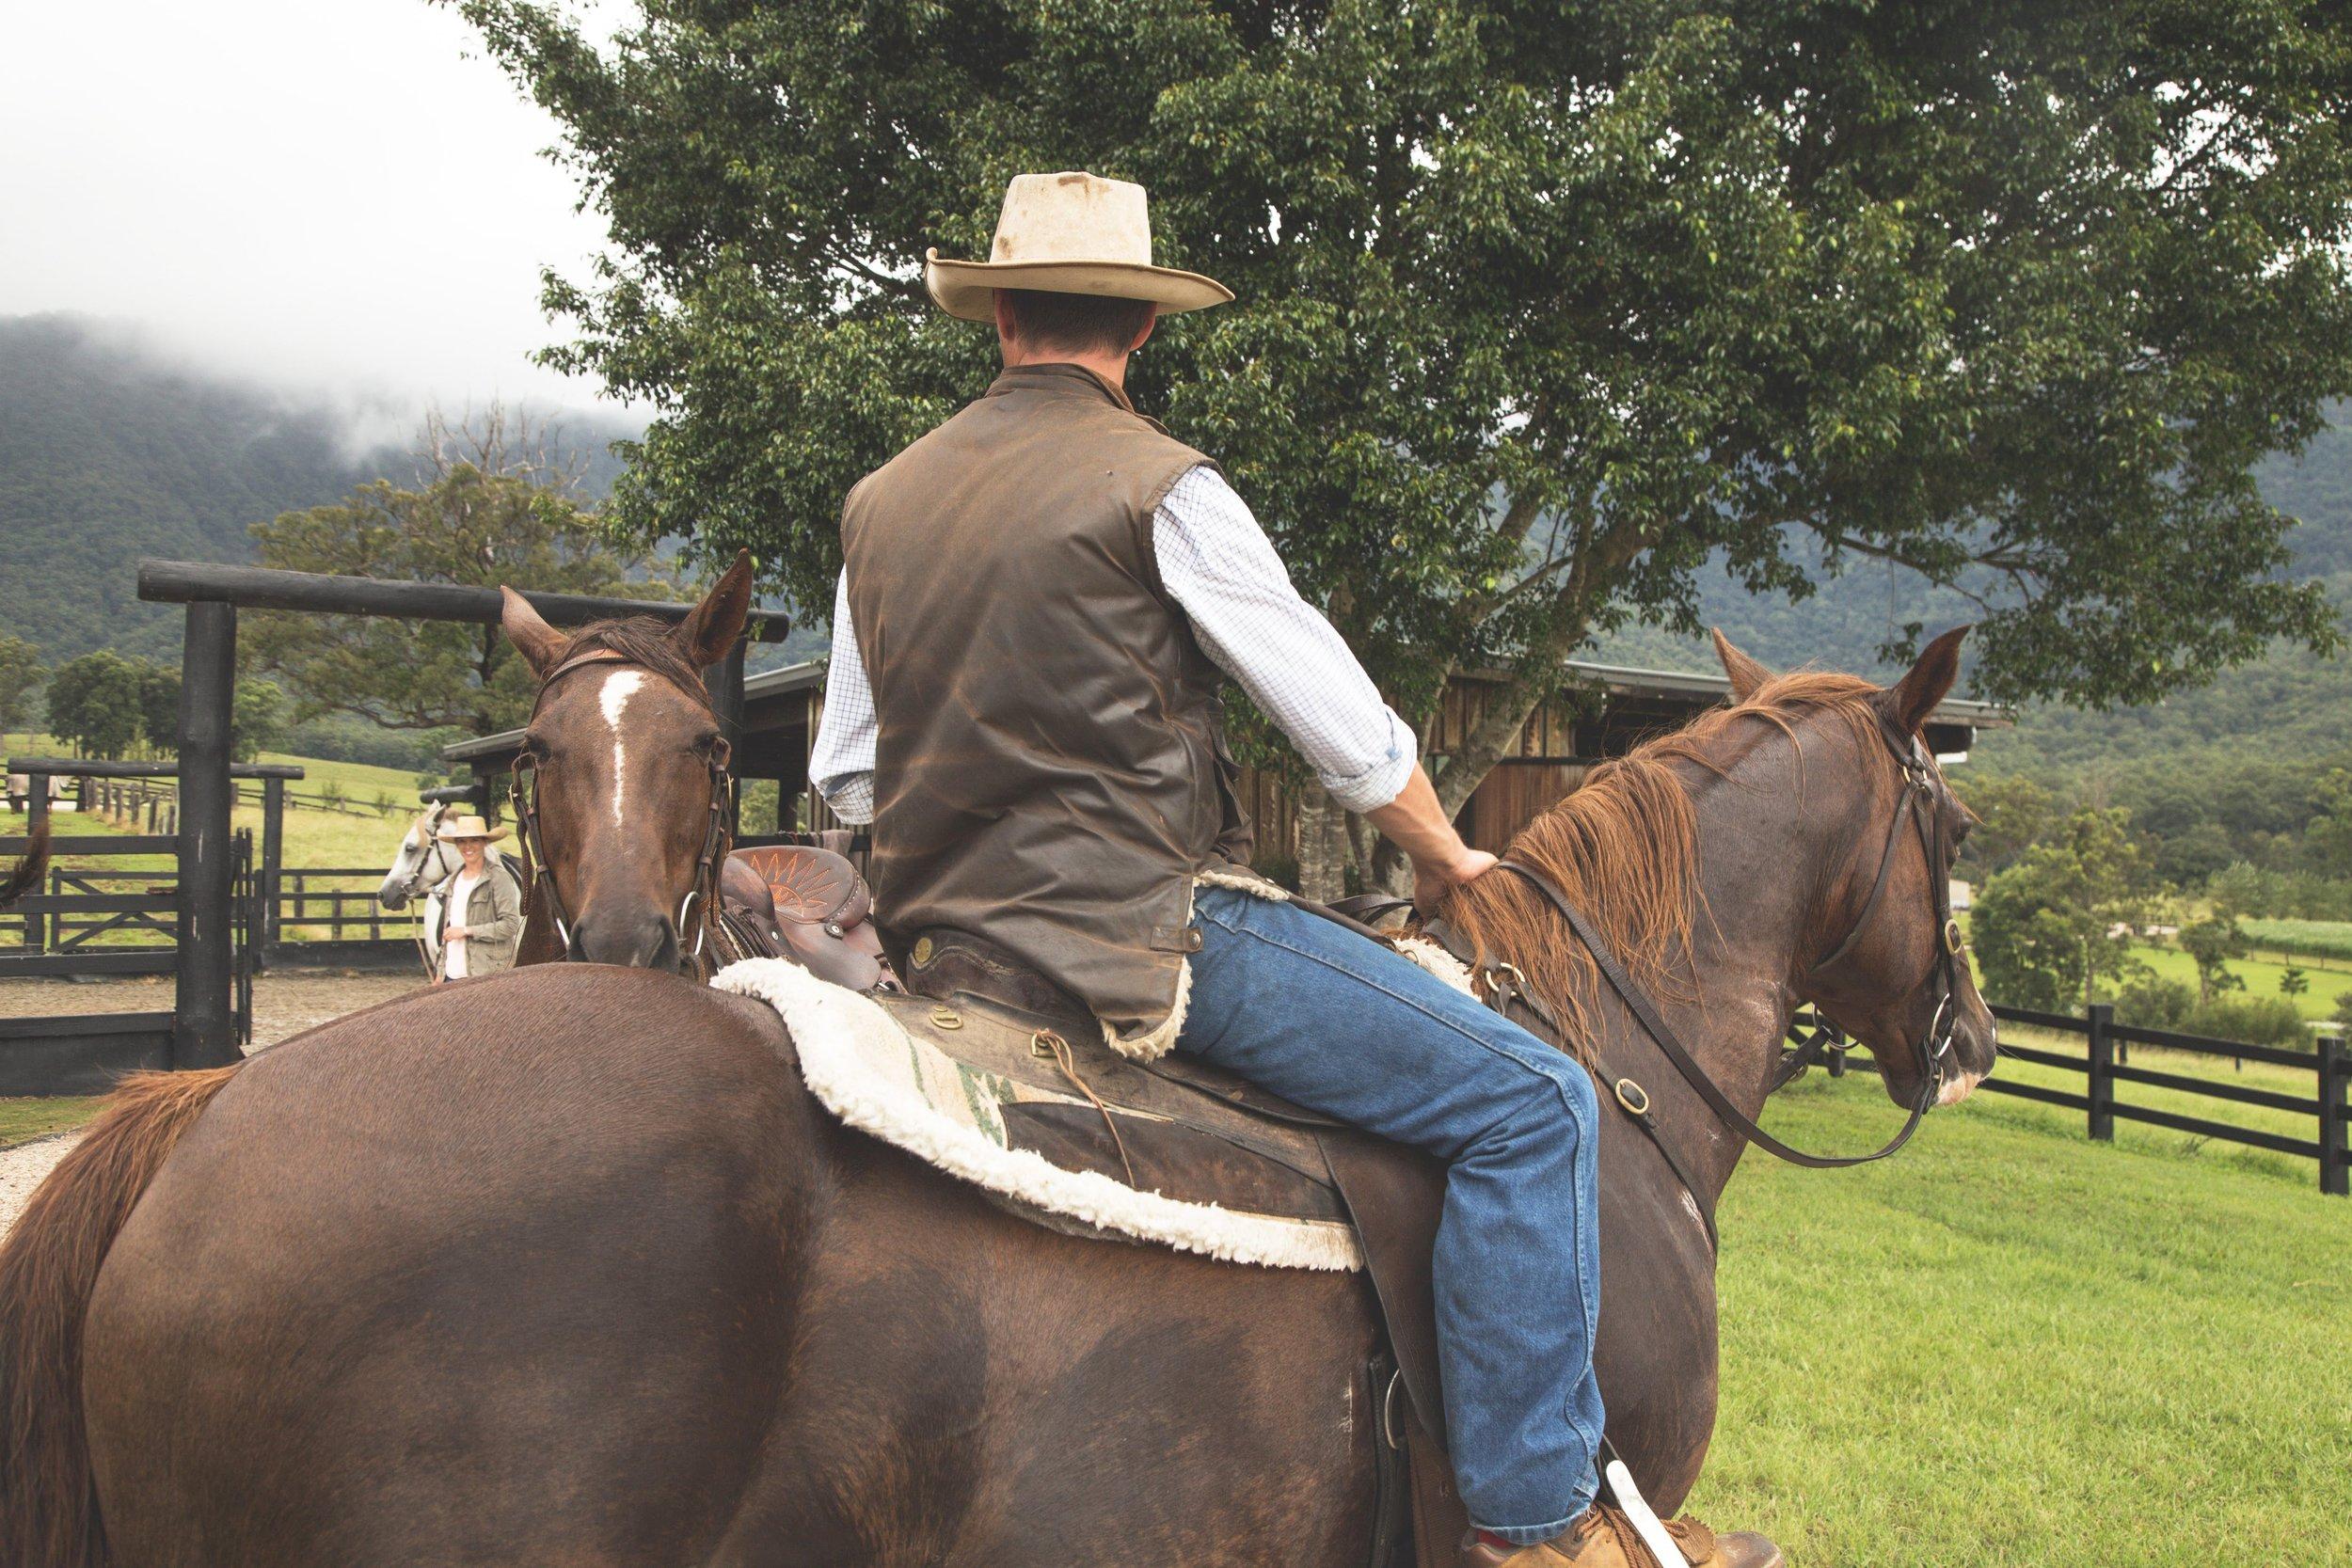 20180310_ABAdur_The Ranch Byron Bay New Edit_076.jpg